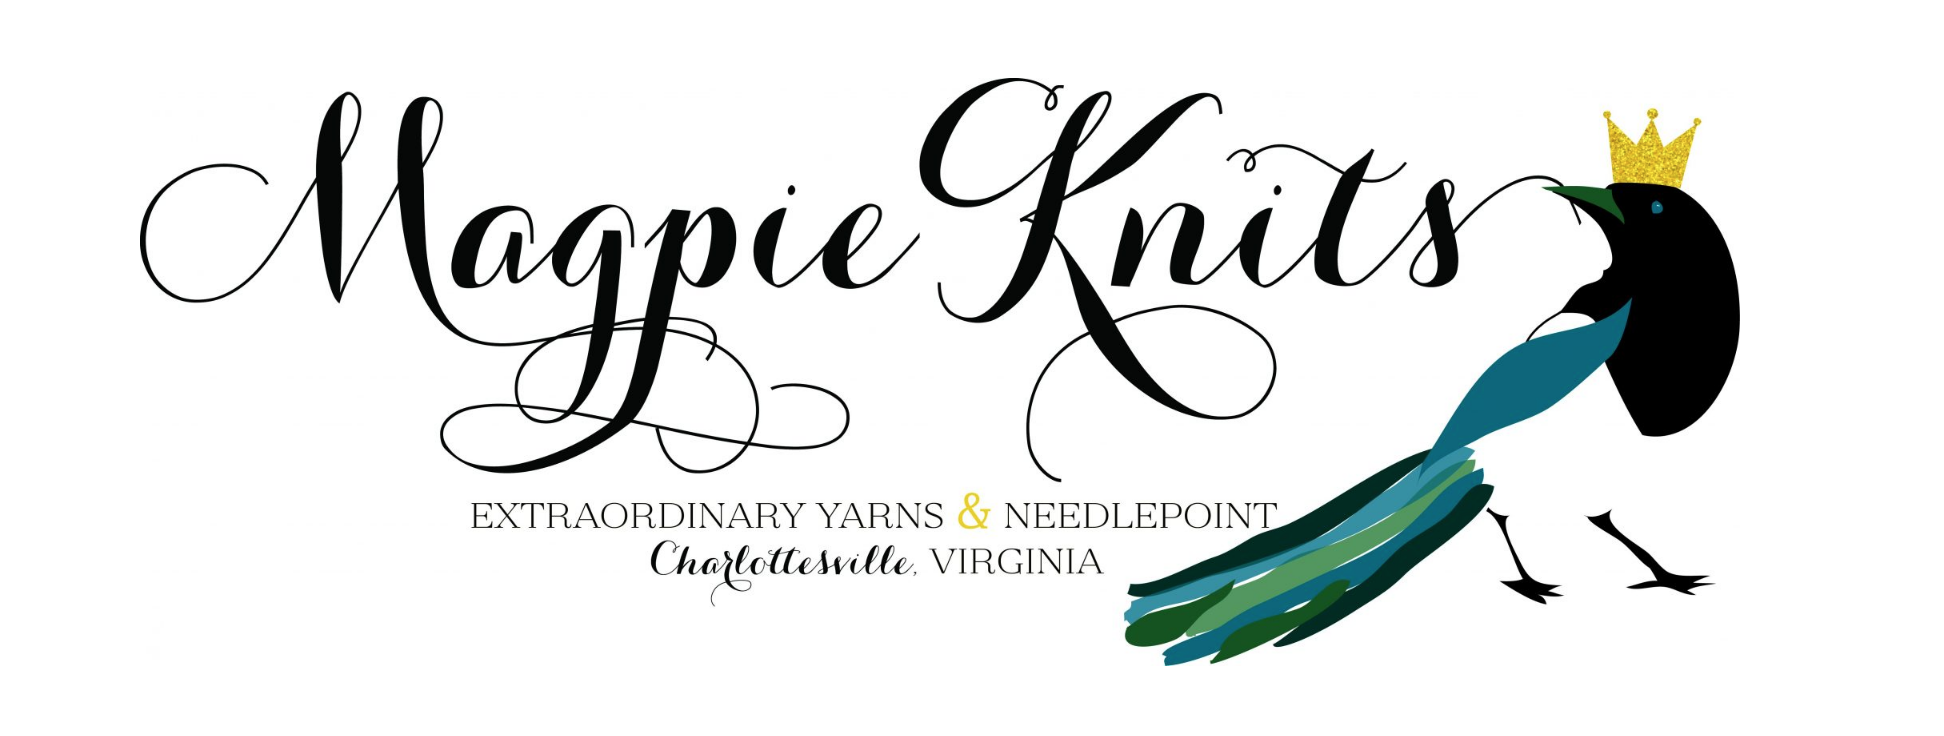 Magpie Knits - Address: 111 W Main St, Charlottesville, VA 22902, USAPhone: +1 434-296-4625http://magpieknits.com/